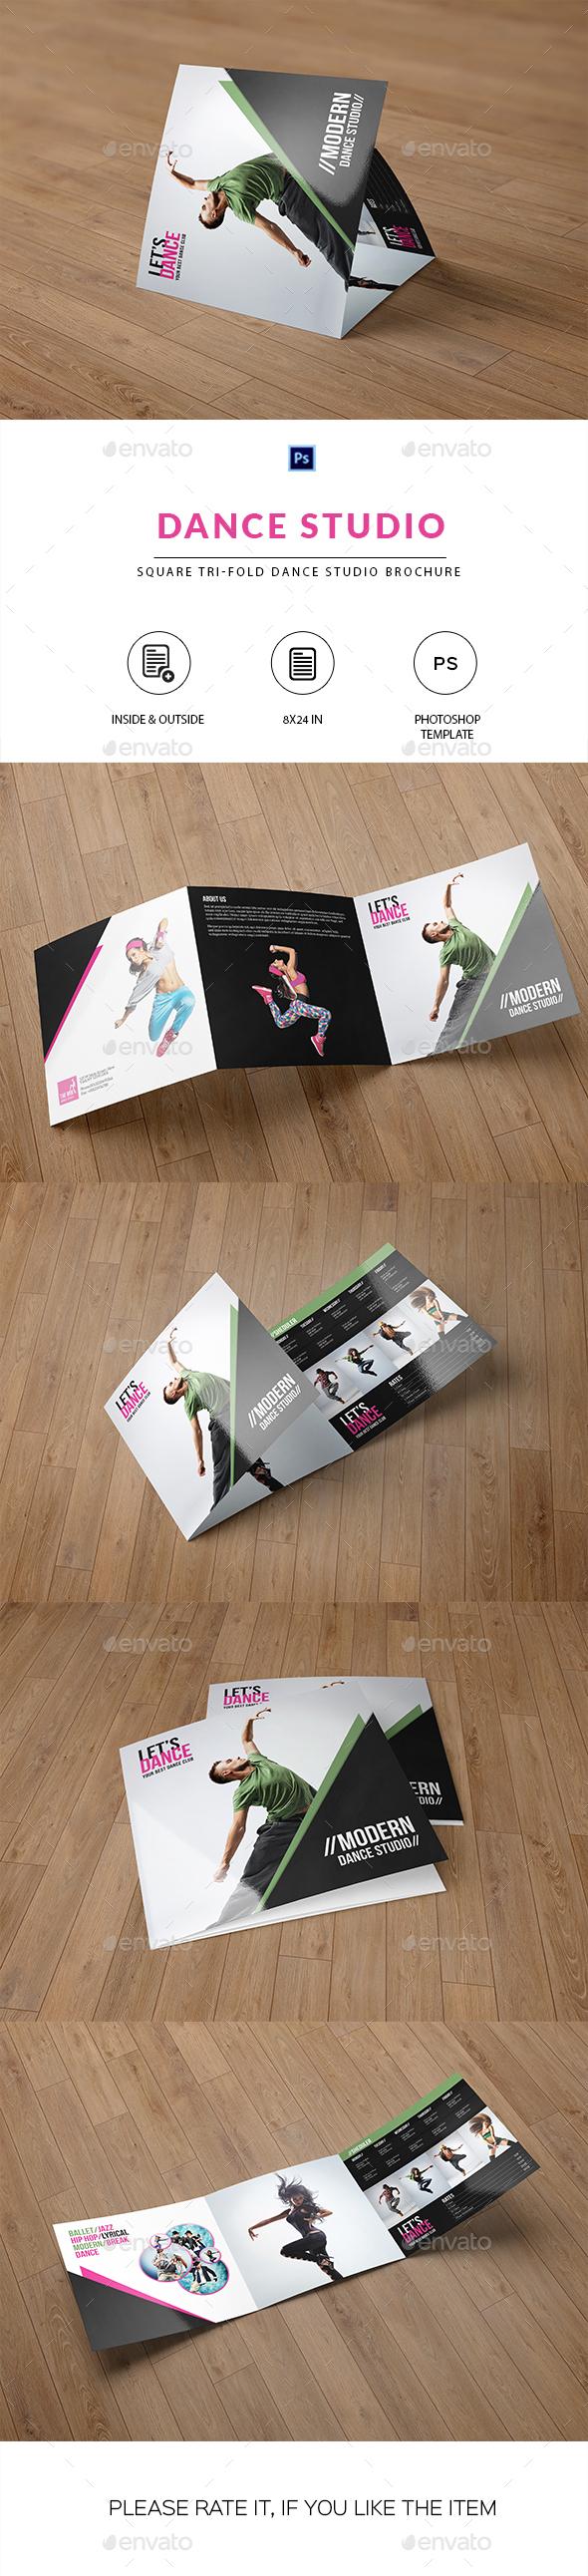 Square Trifold Brochure for Dance Studio - Corporate Brochures